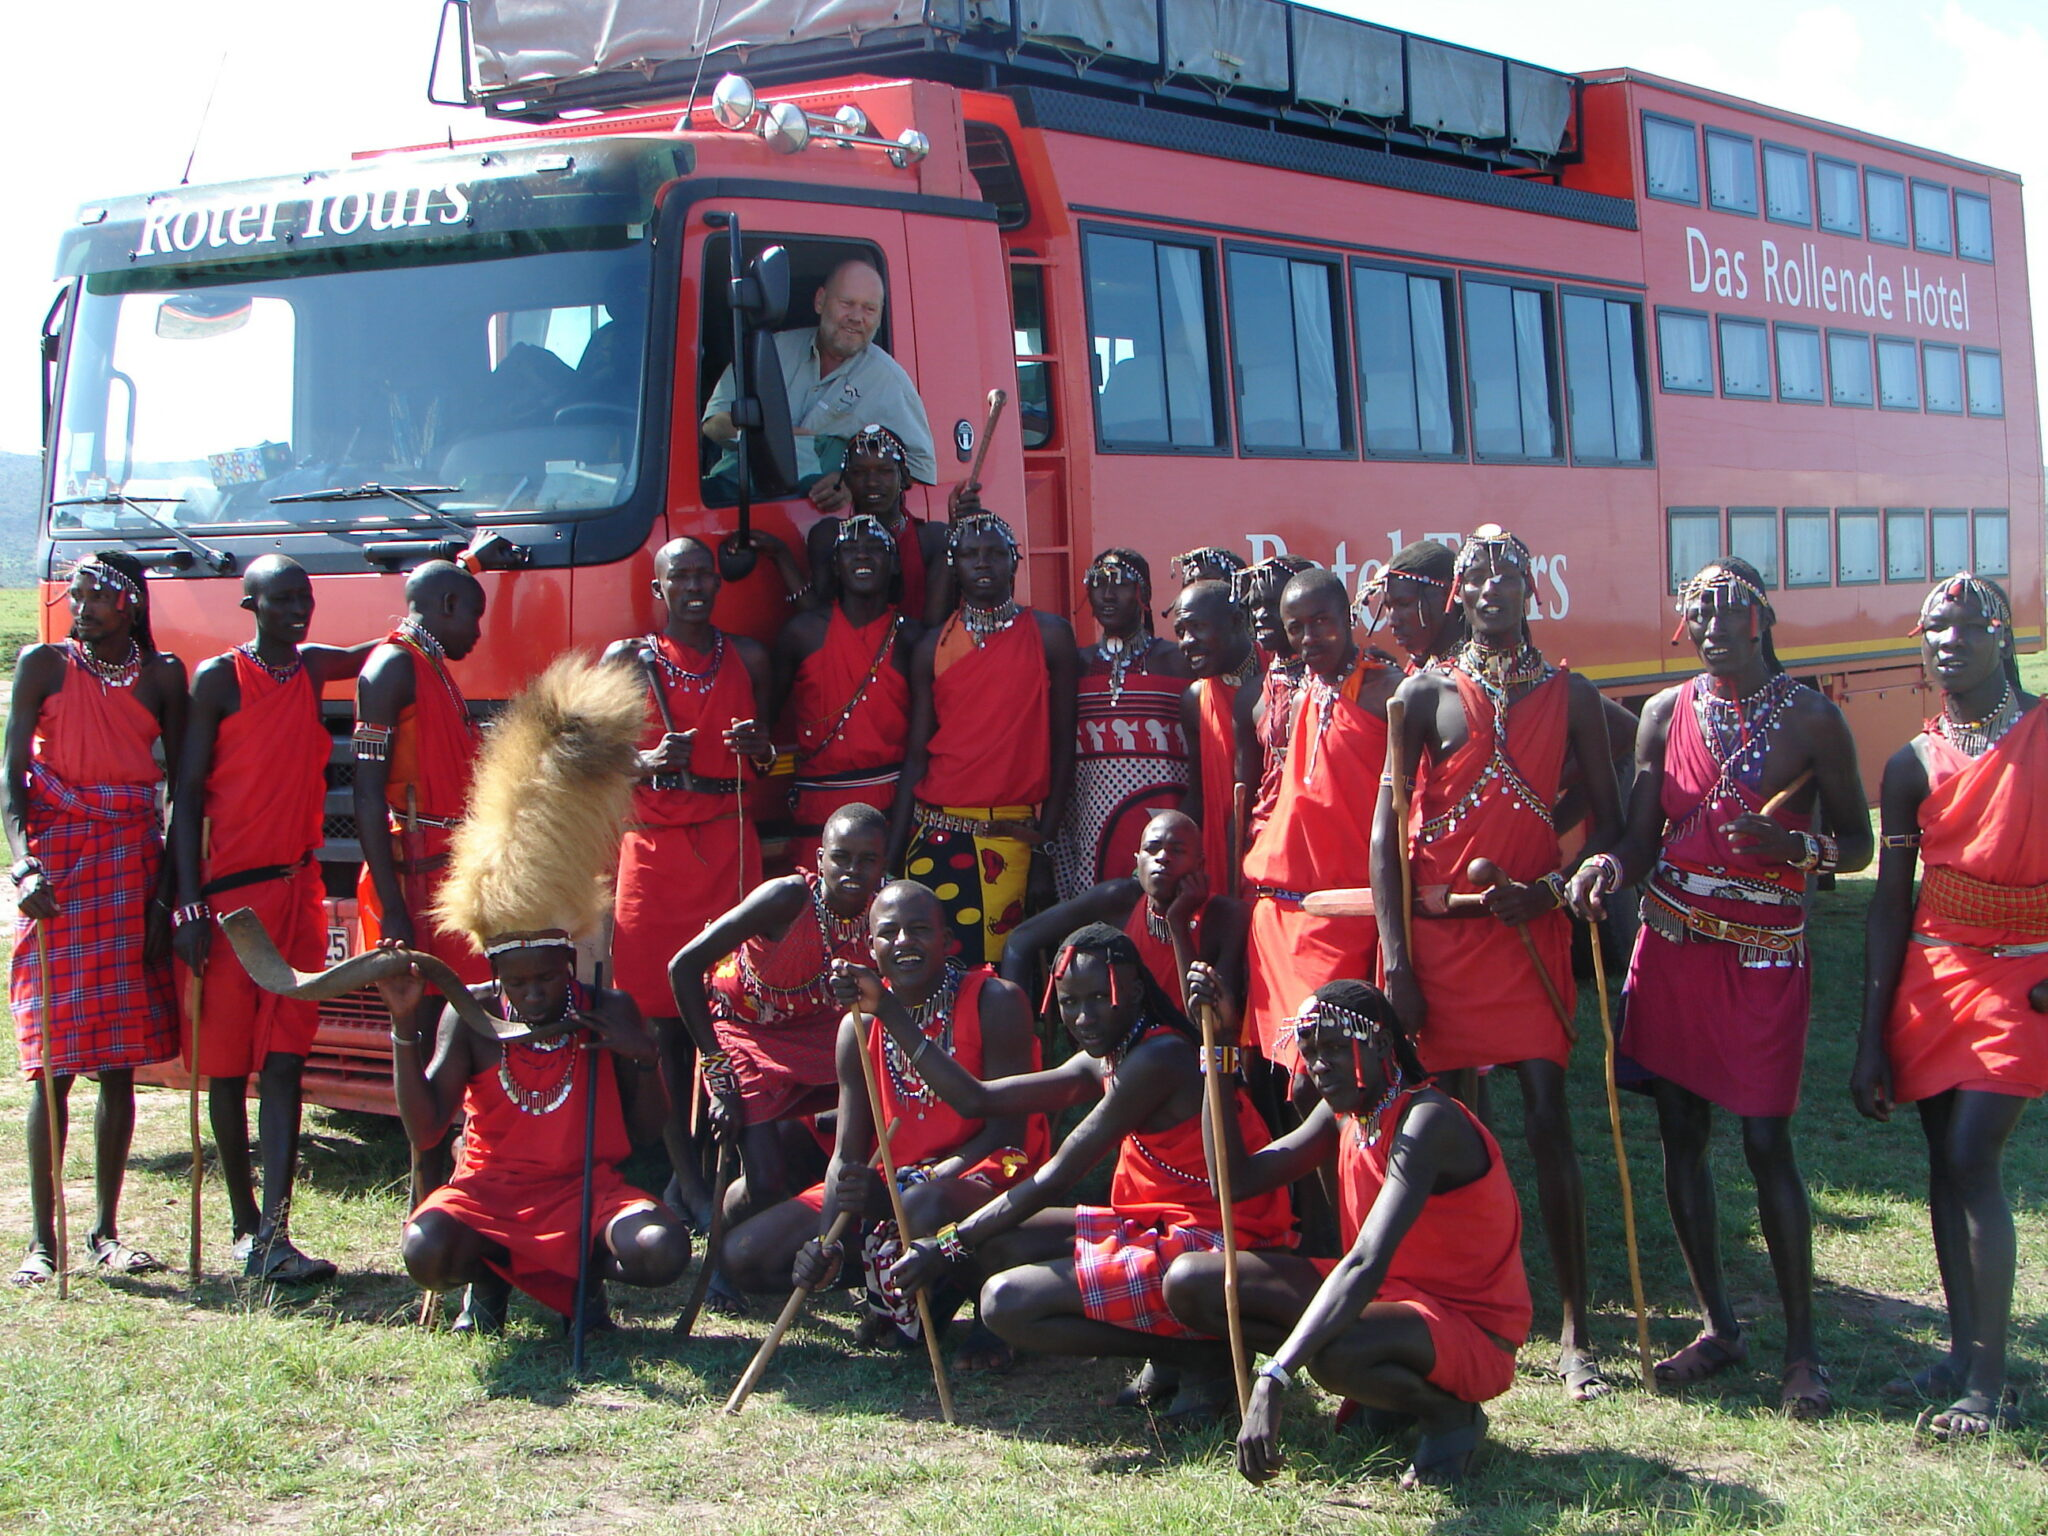 Mit Rotel Tours in Afrika - Kultur hautnah - Rotel Tours